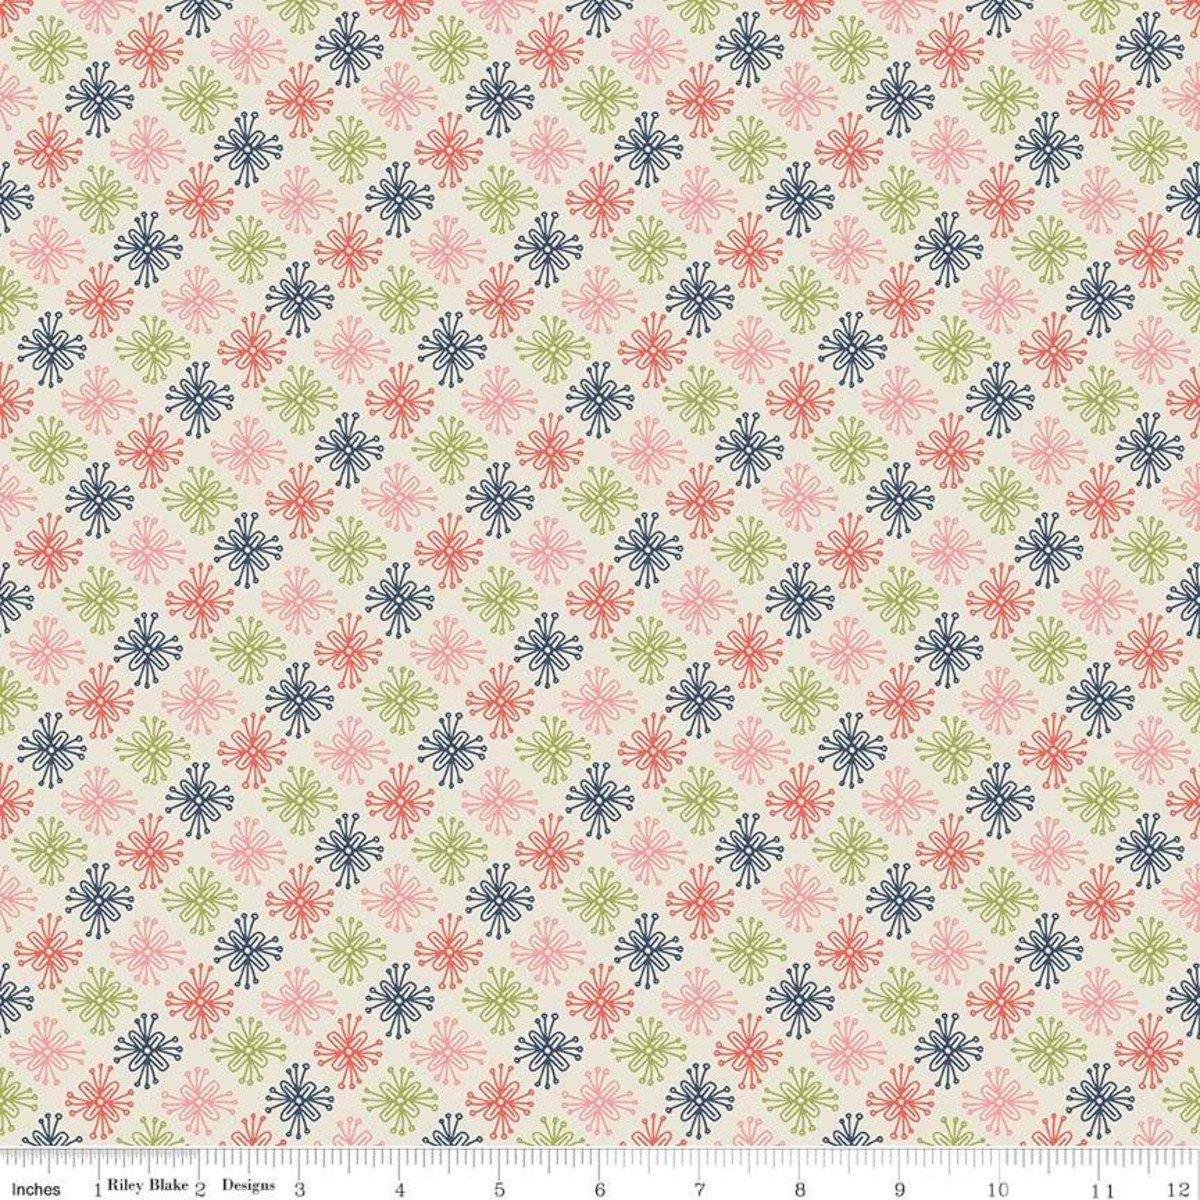 Sew Retro Star Flower Cream